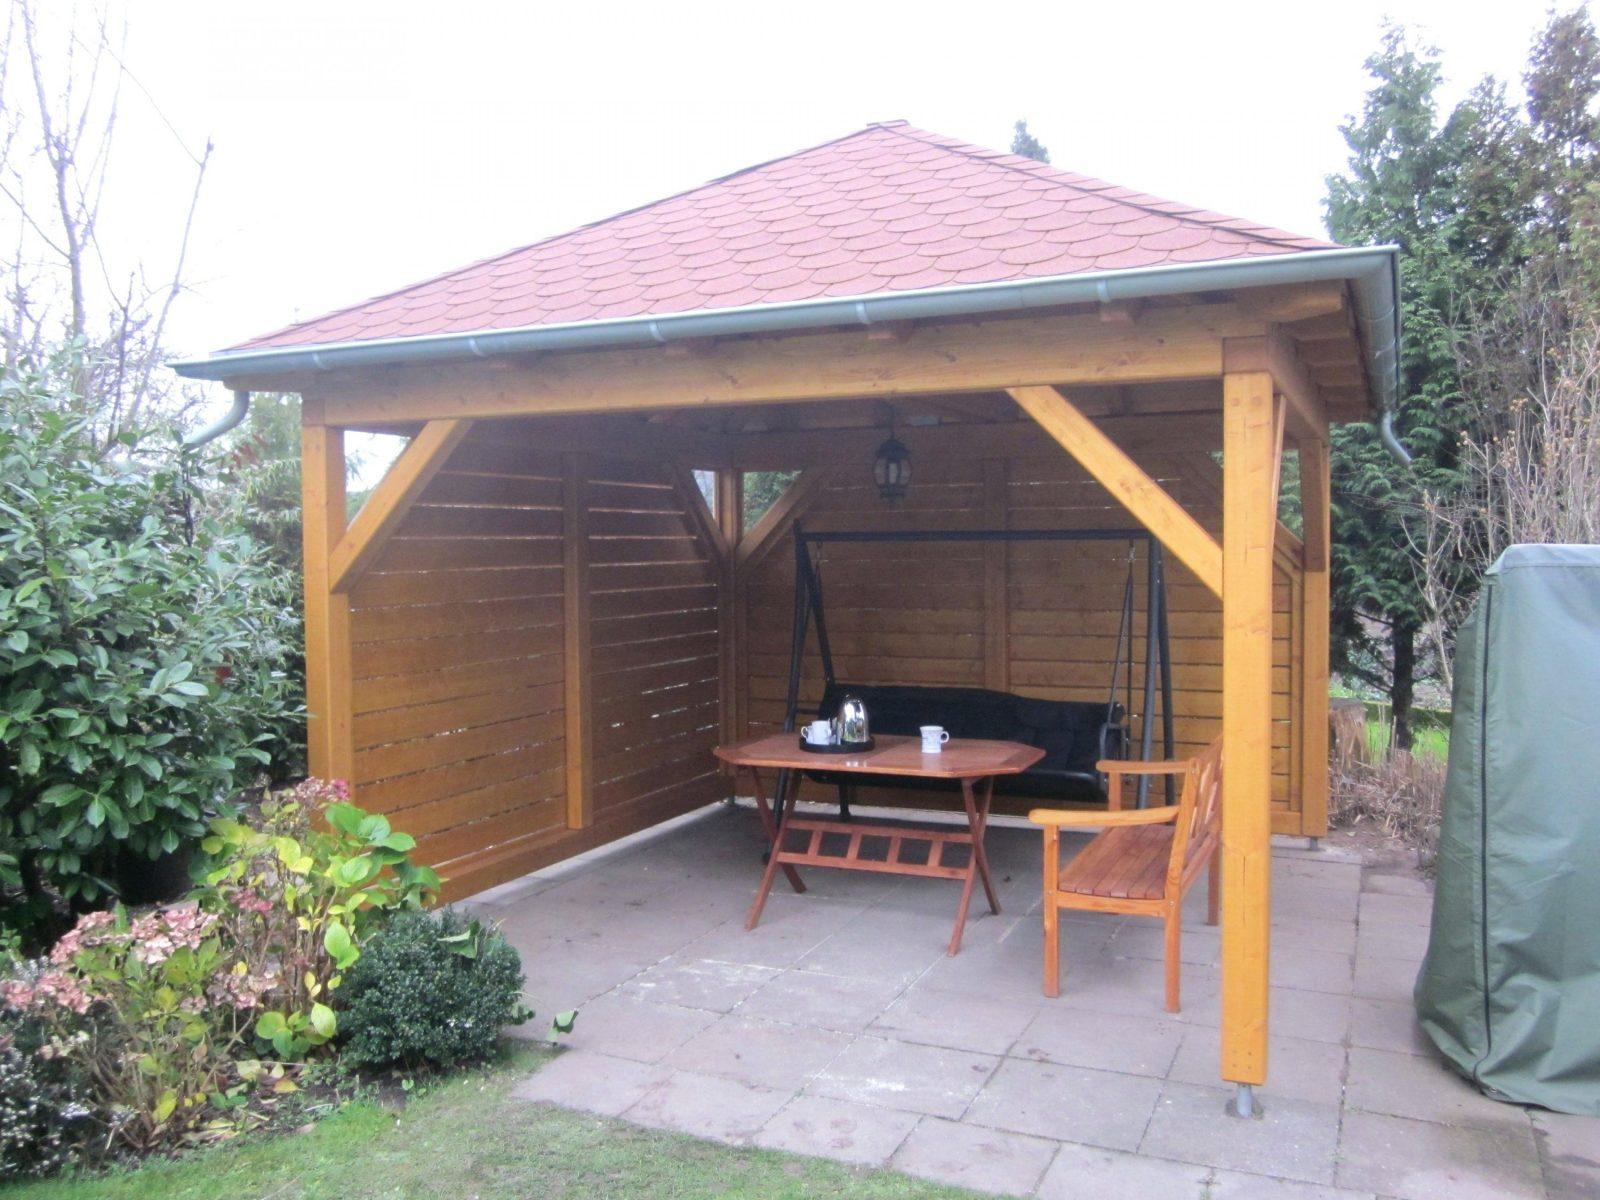 Pavillon holz 4x4 selber bauen haus design ideen - Gartenpavillon aus holz selber bauen ...